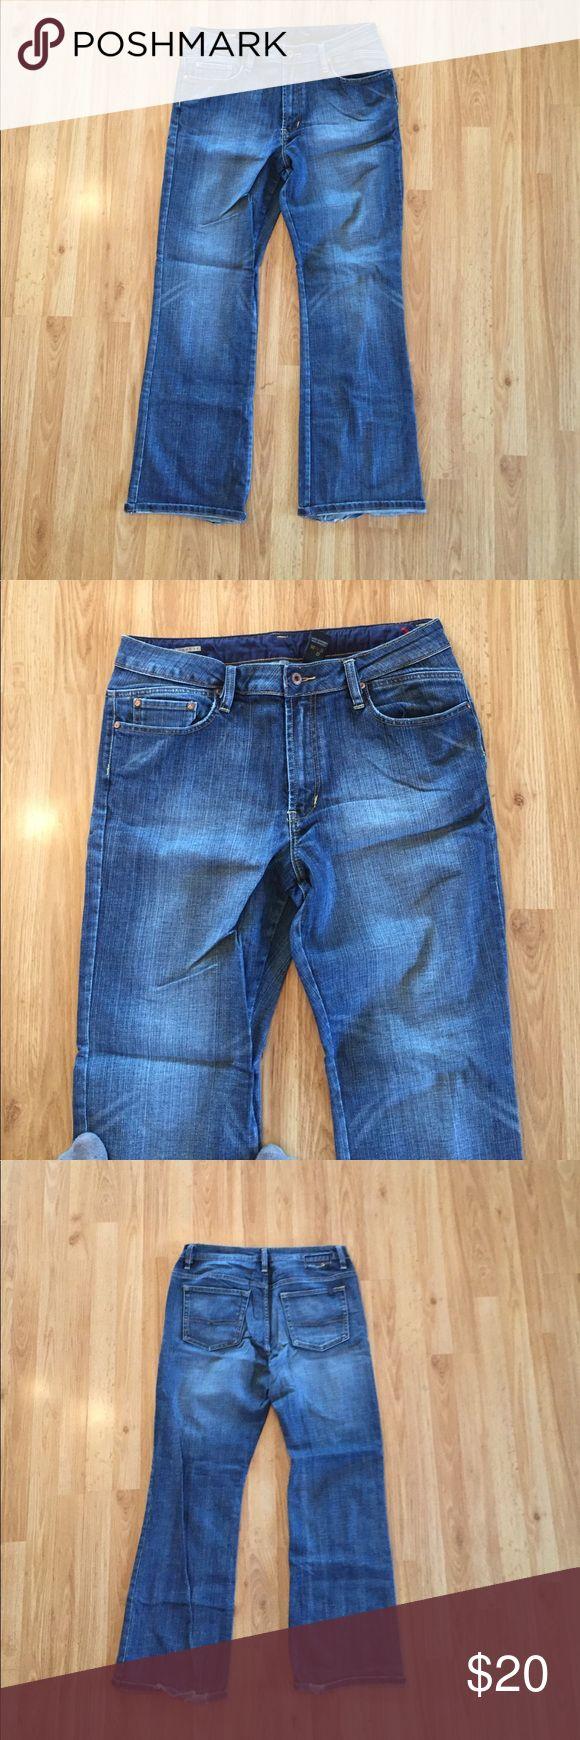 Men's BUFFALO jeans size 36x32 Men's BUFFALO jeans size 36x32 Buffalo David Bitton Jeans